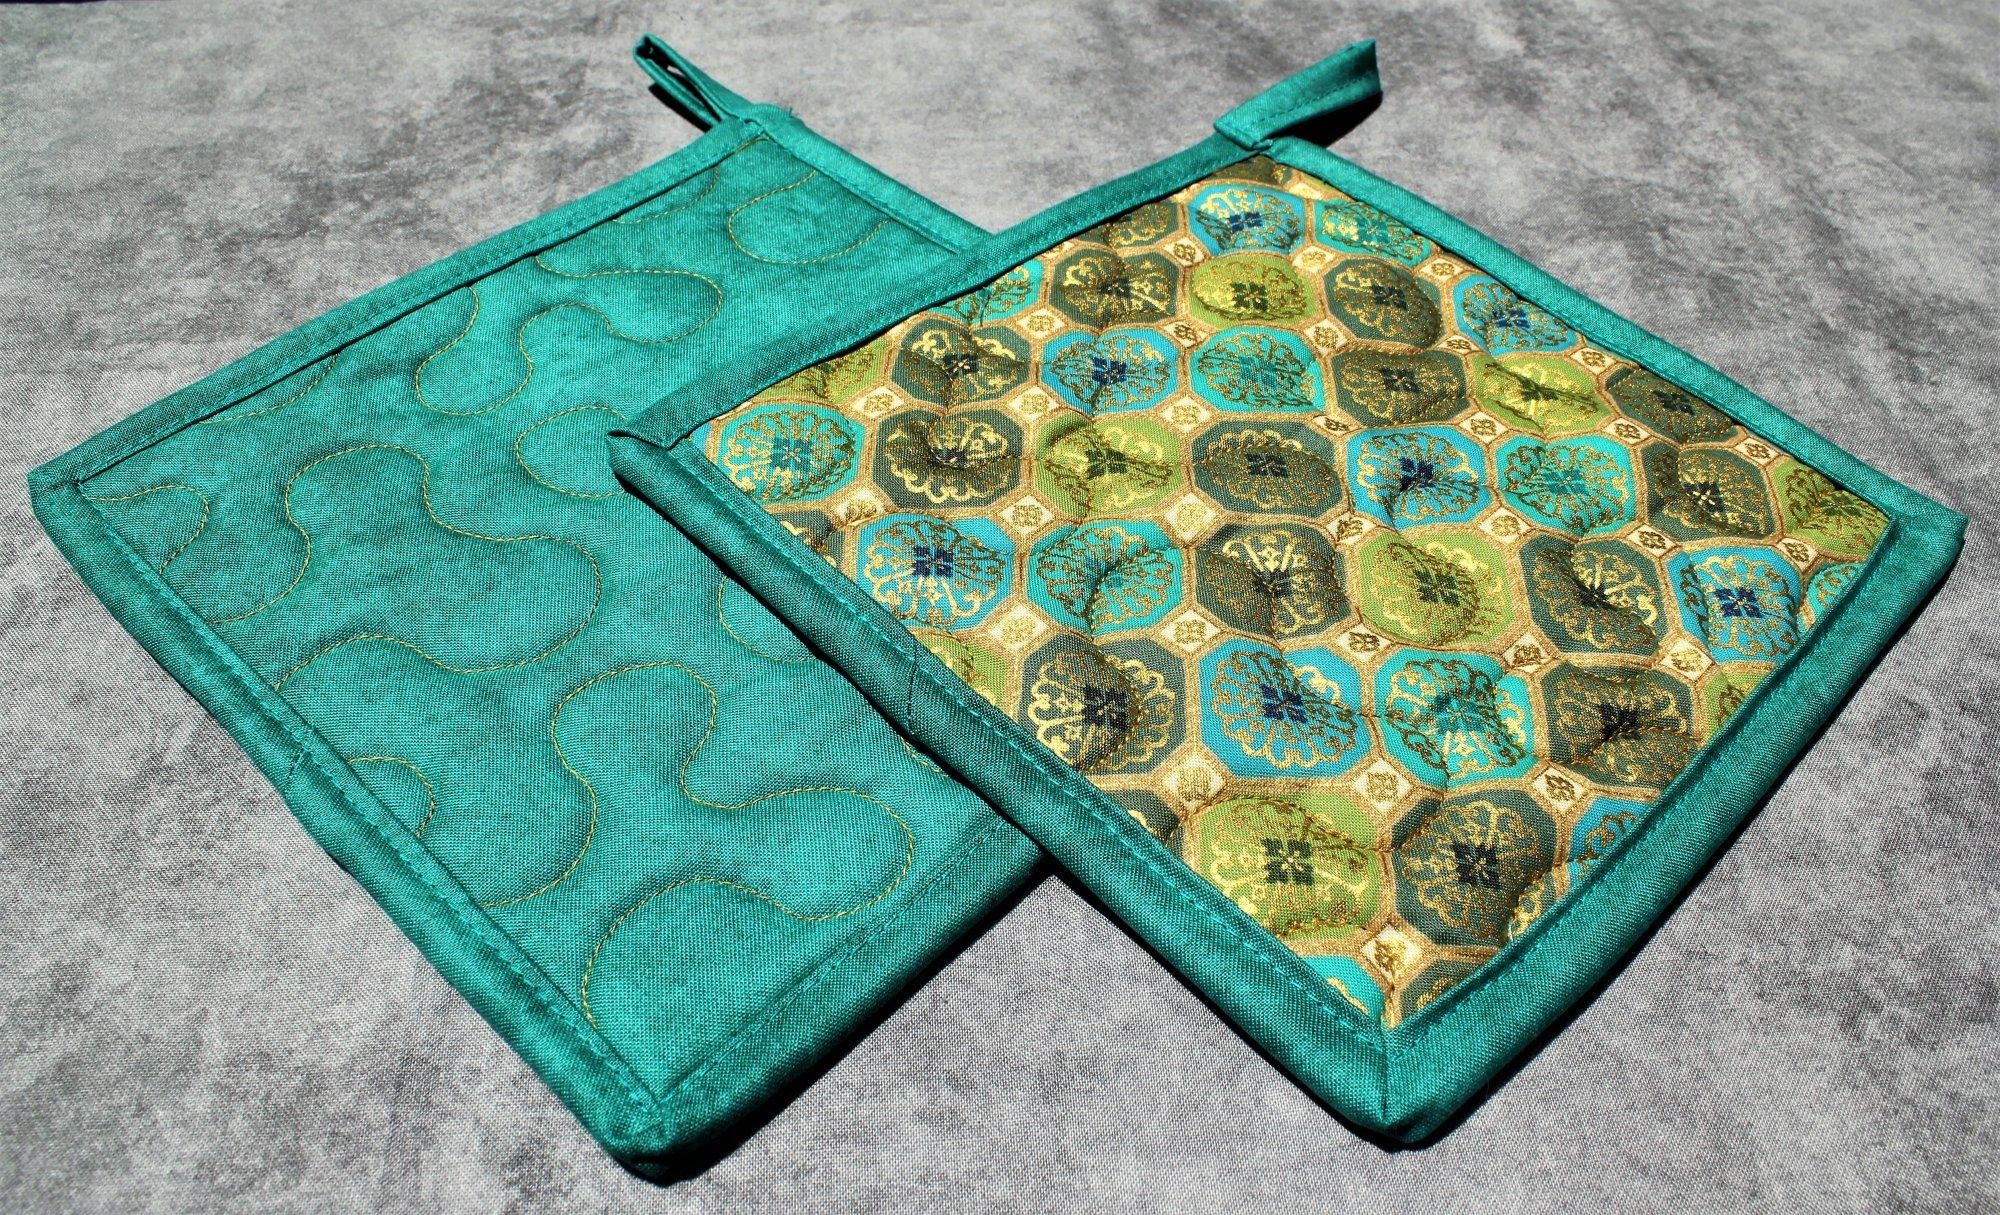 Green/Teal/Blue/ Gold Geometric Potholders Set of 2